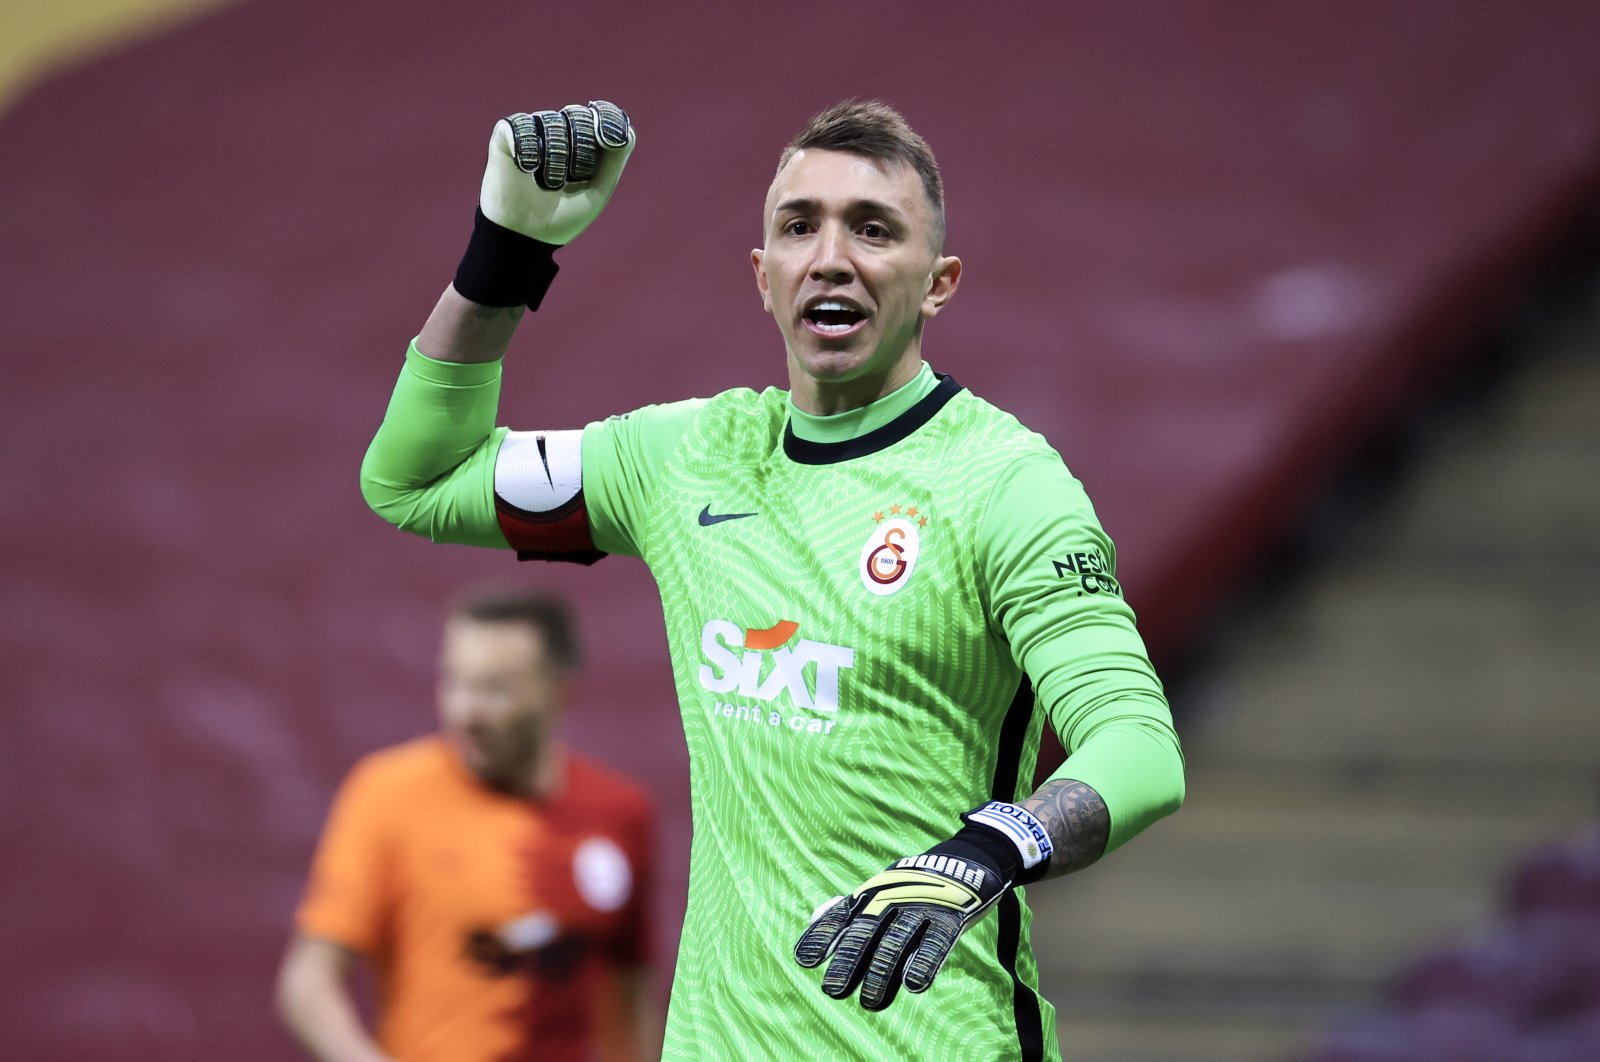 Galatasaray's veteran goalkeeper Fernando Muslera reacts during a match against Sivasspor at the Türk Telekom Stadium, Istanbul, Turkey, March 7, 2021.